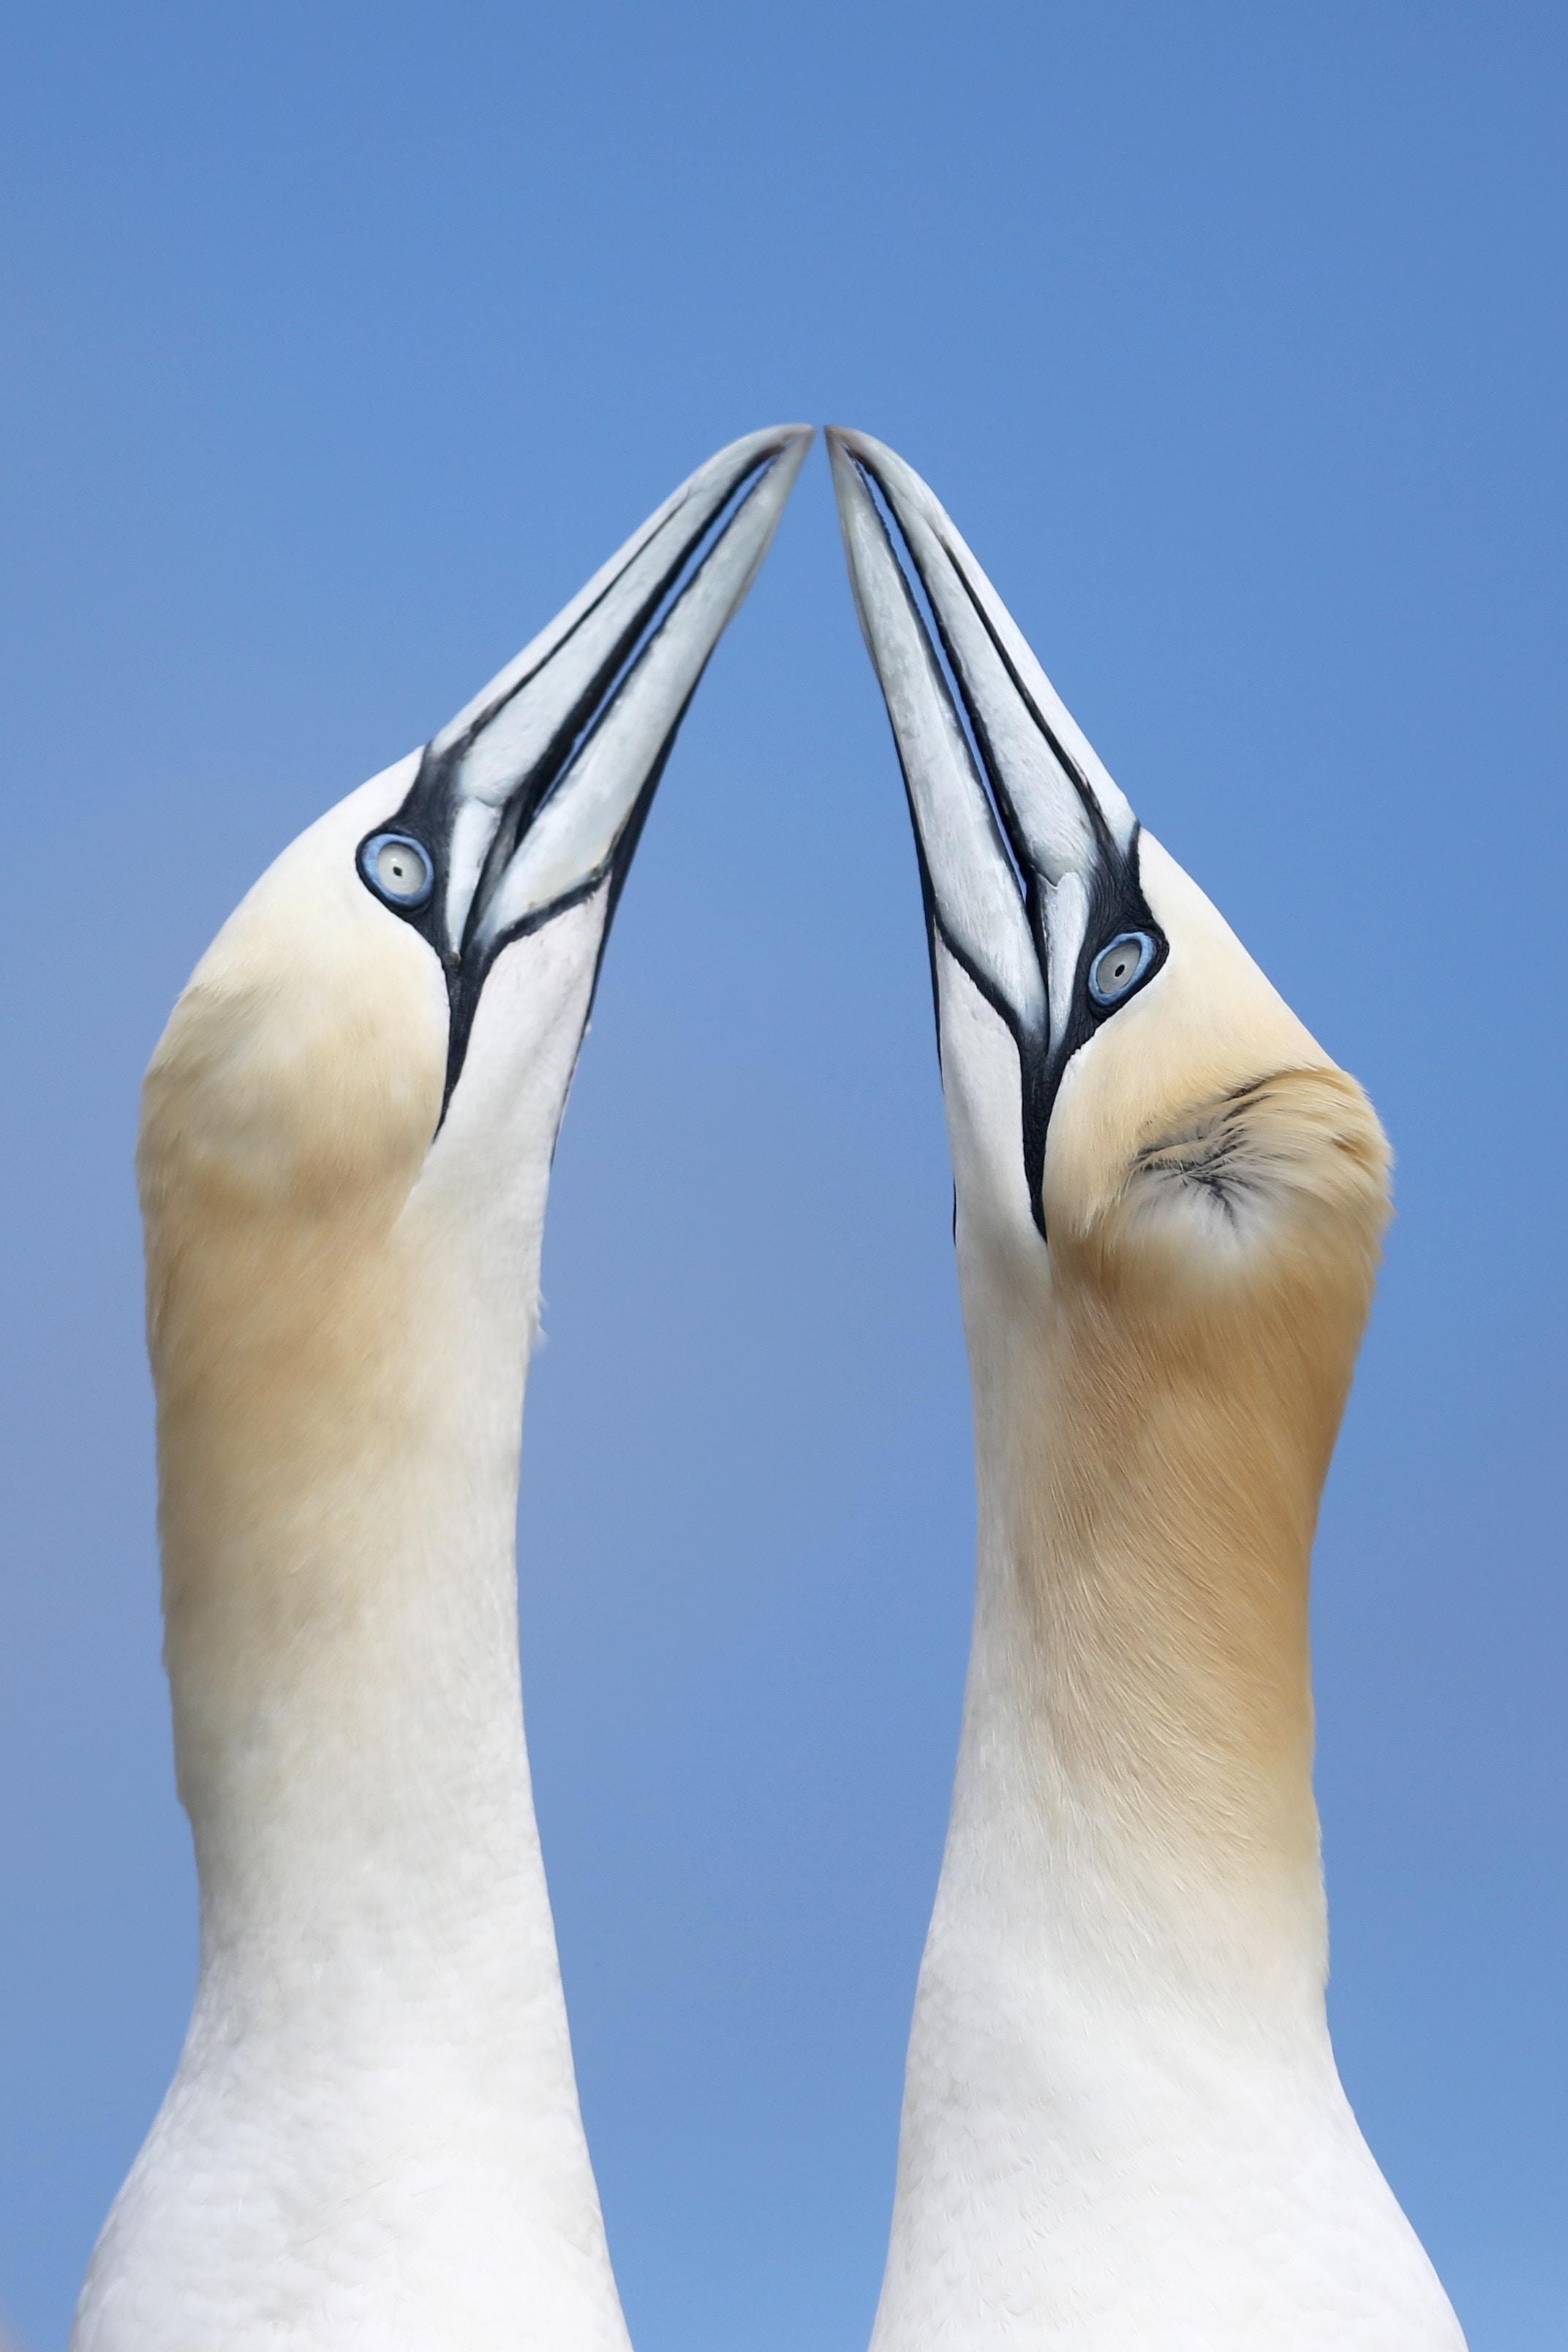 two birds colliding their beaks